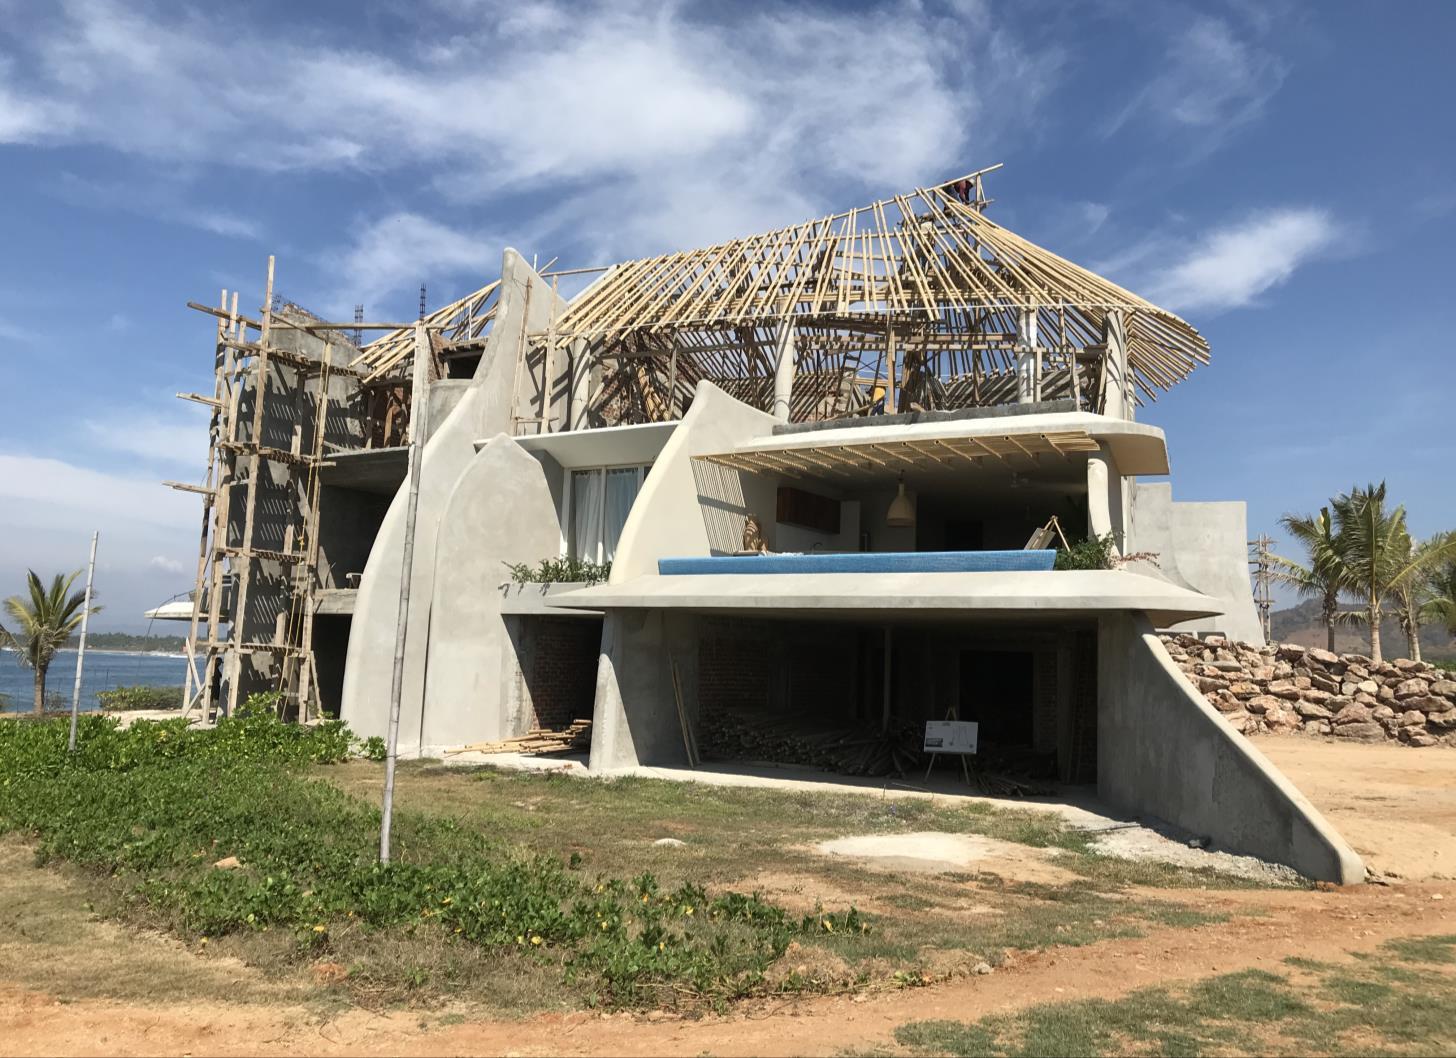 REPORTE-FOTOGRAFICO-PUNTA-MAJAHUA-21-DE-ENERO-DEL-2018-034.jpg